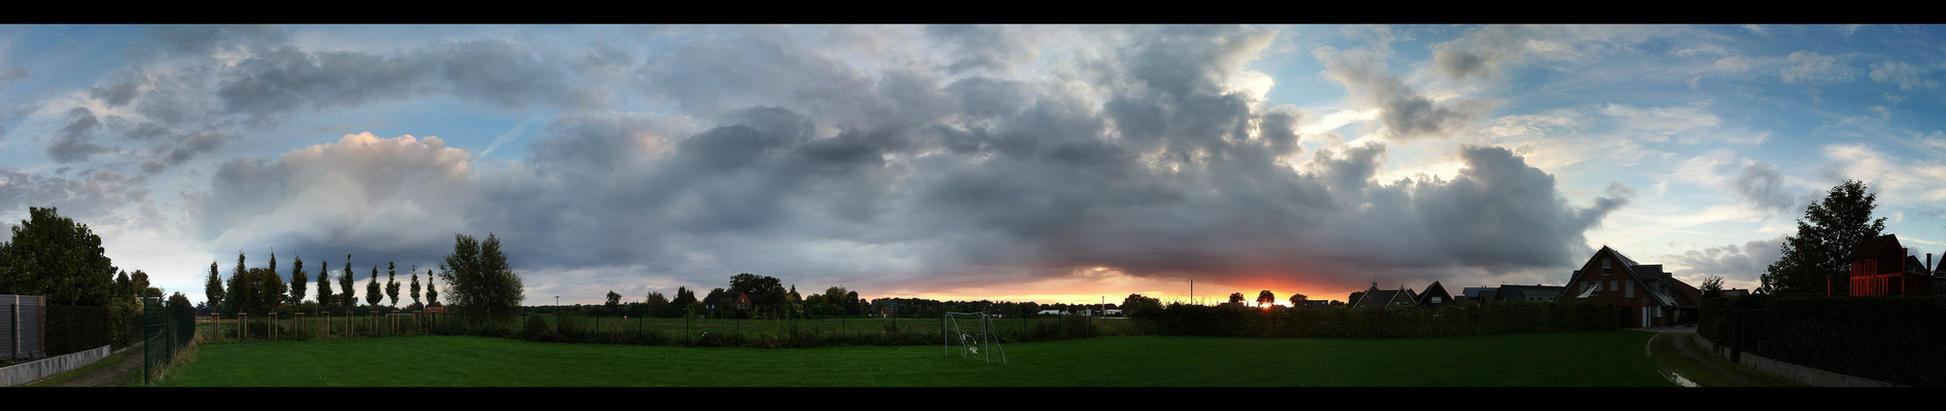 Dingden Sunset (Panorama) by skywalkerdesign